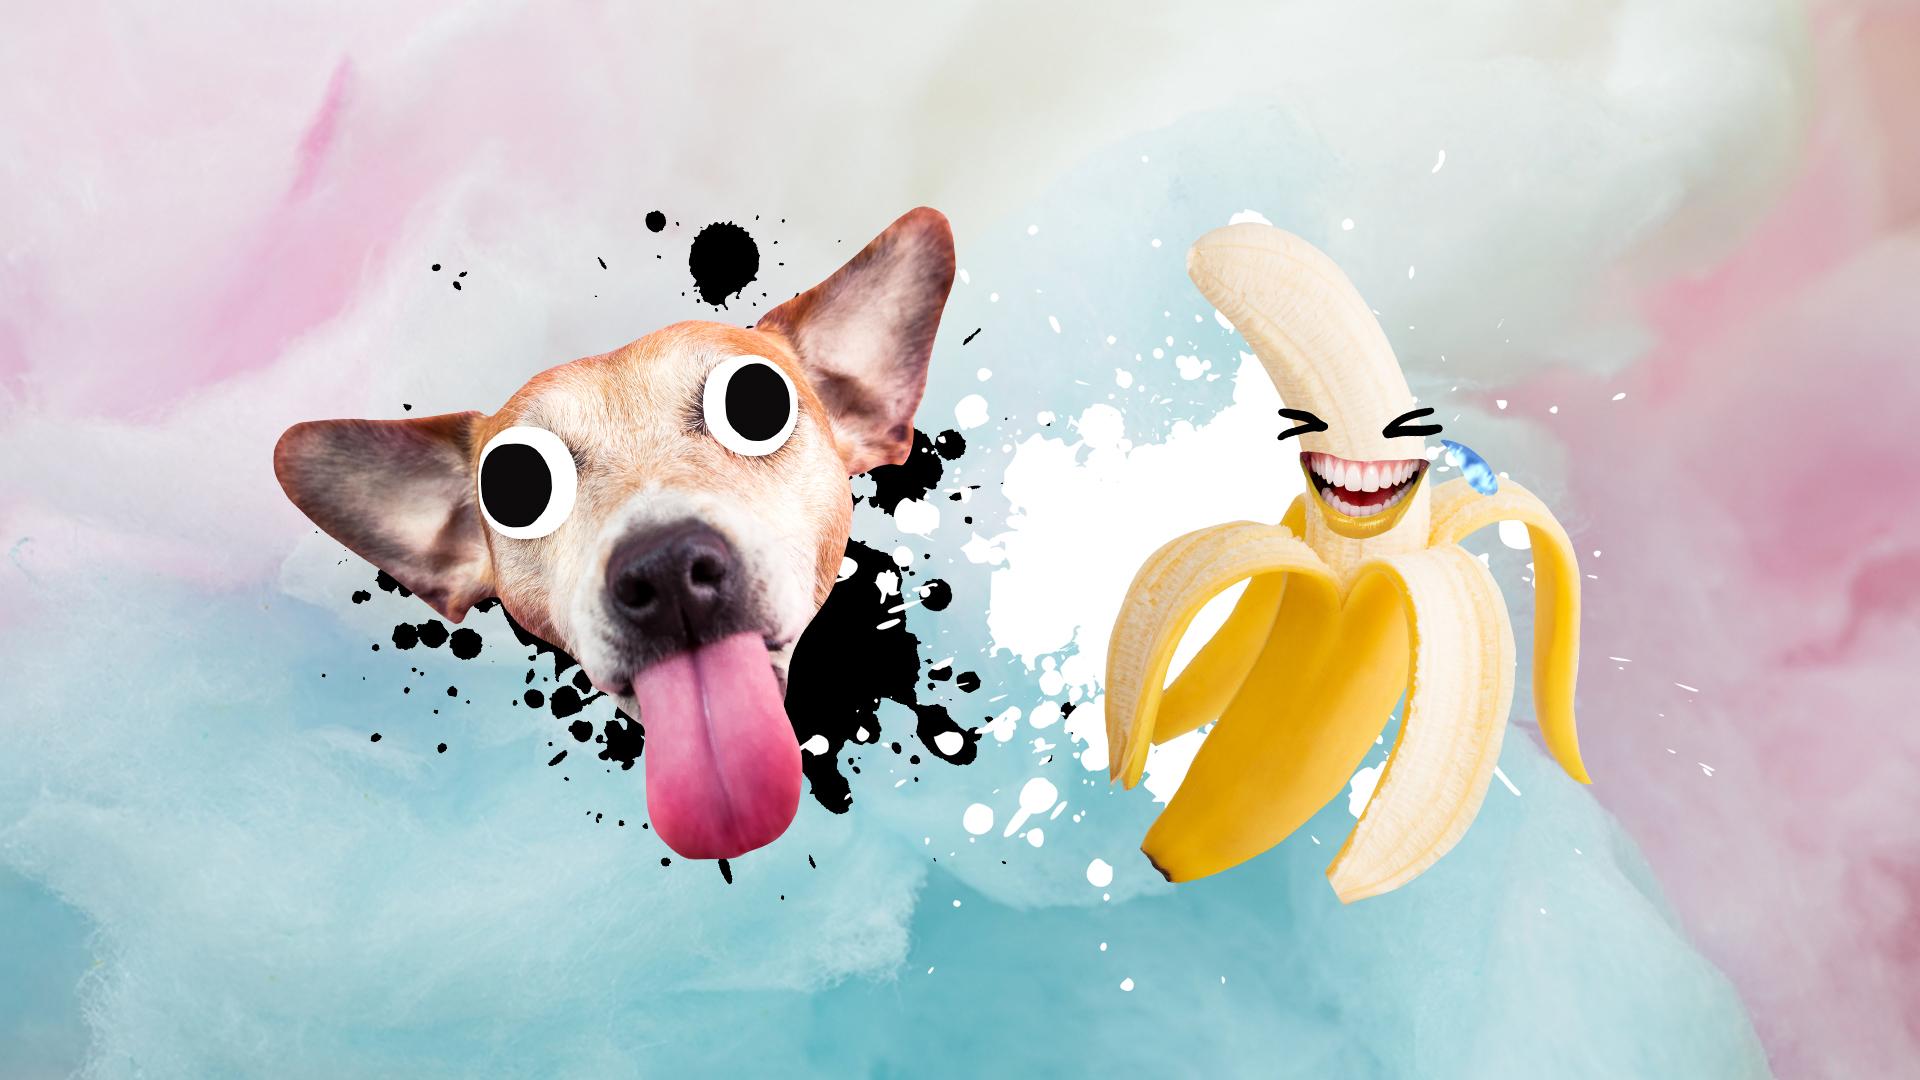 A laughing banana and a cheeky dog